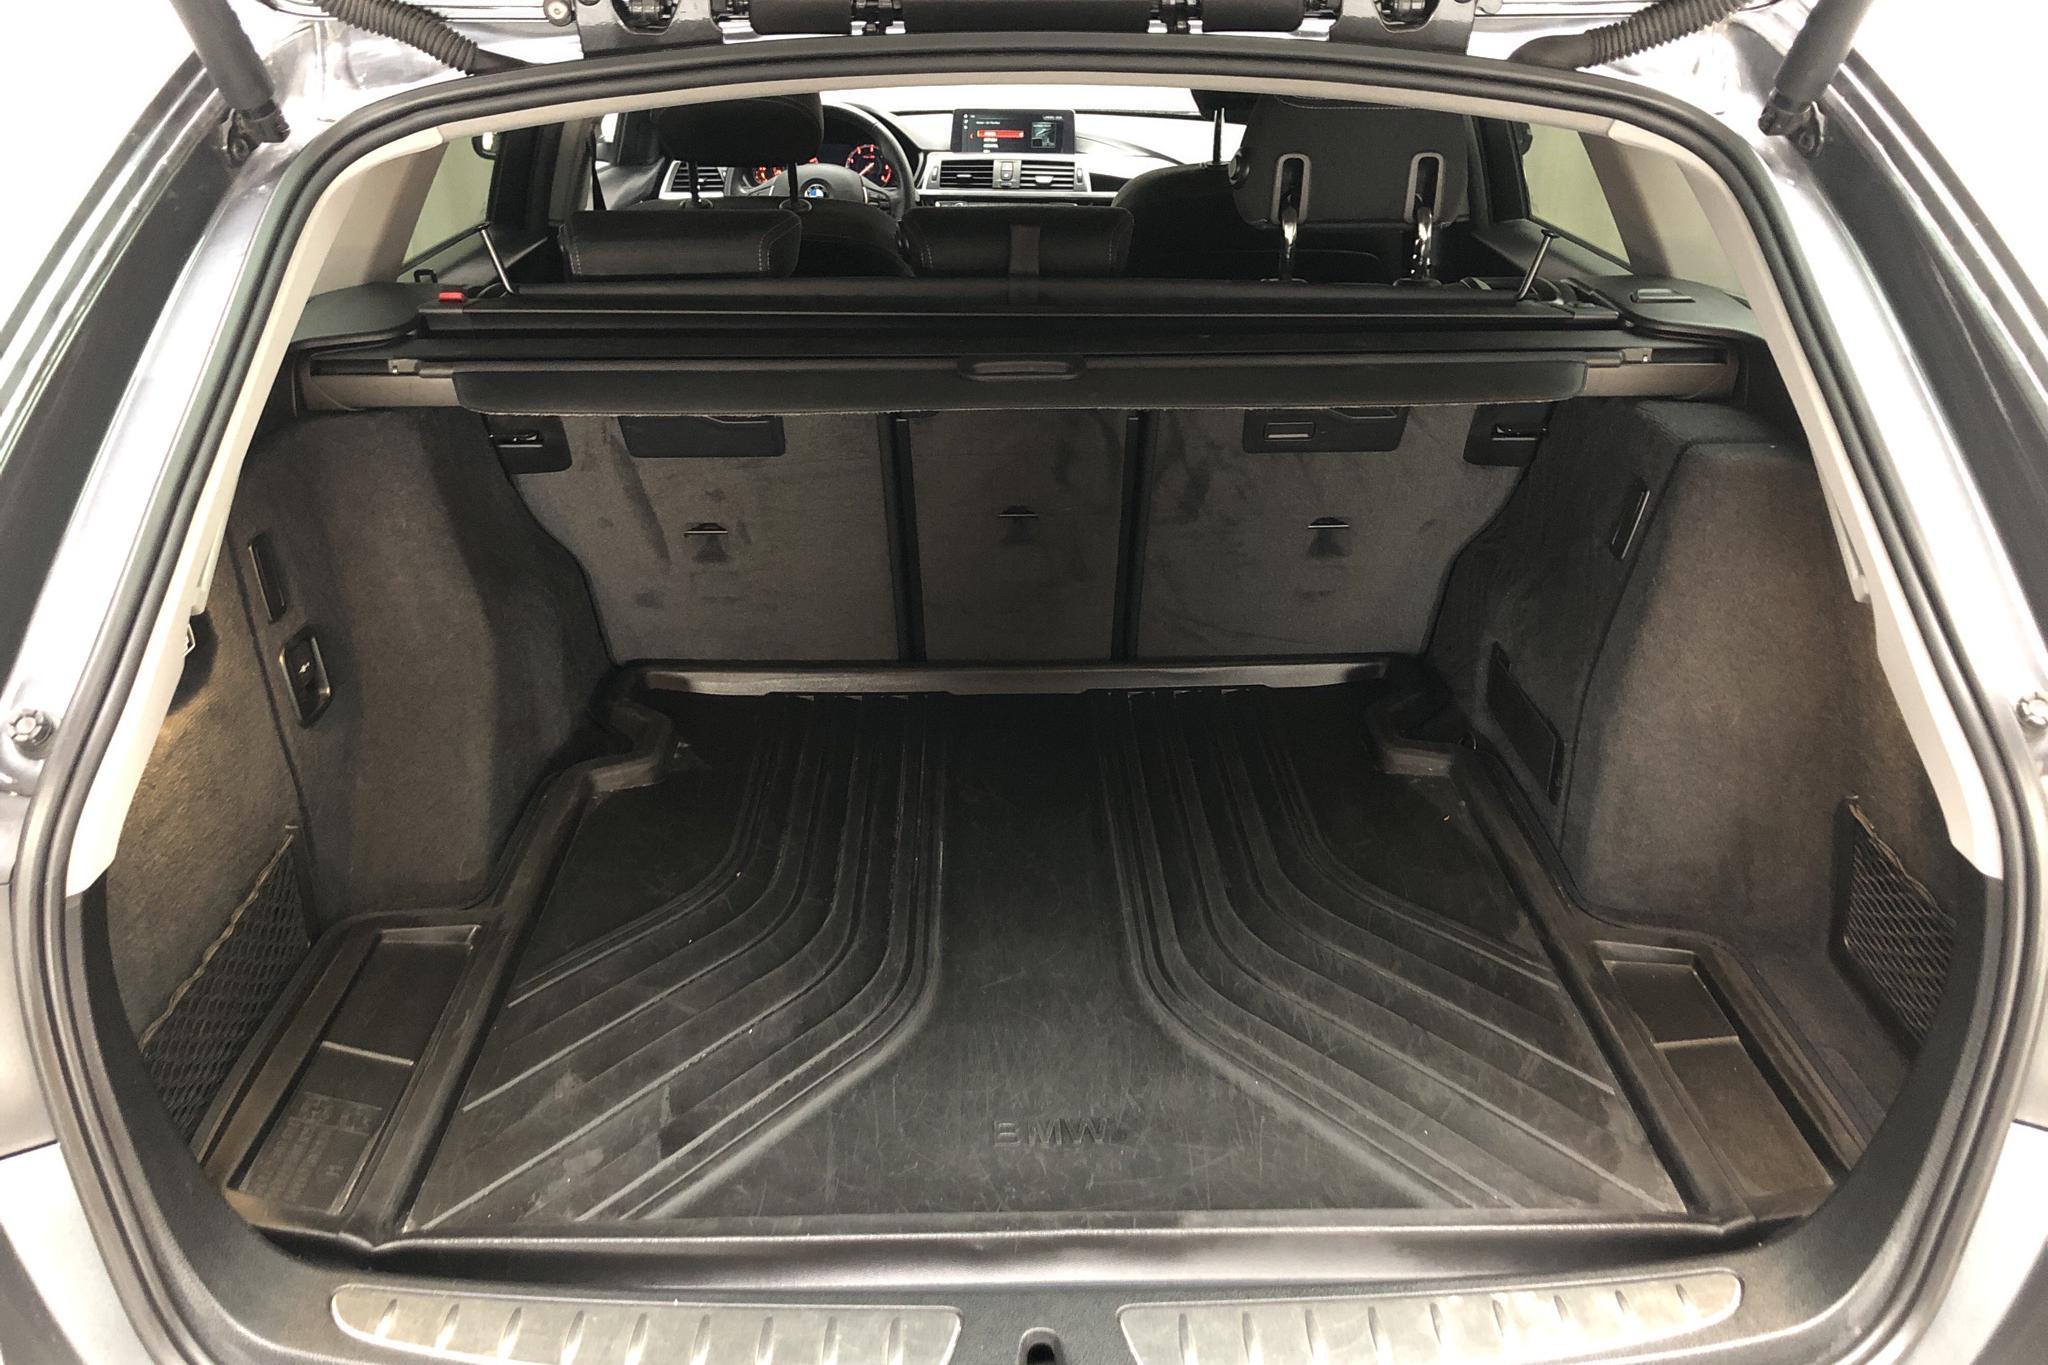 BMW 320d Touring, F31 (190hk) - 5 907 mil - Automat - grå - 2018